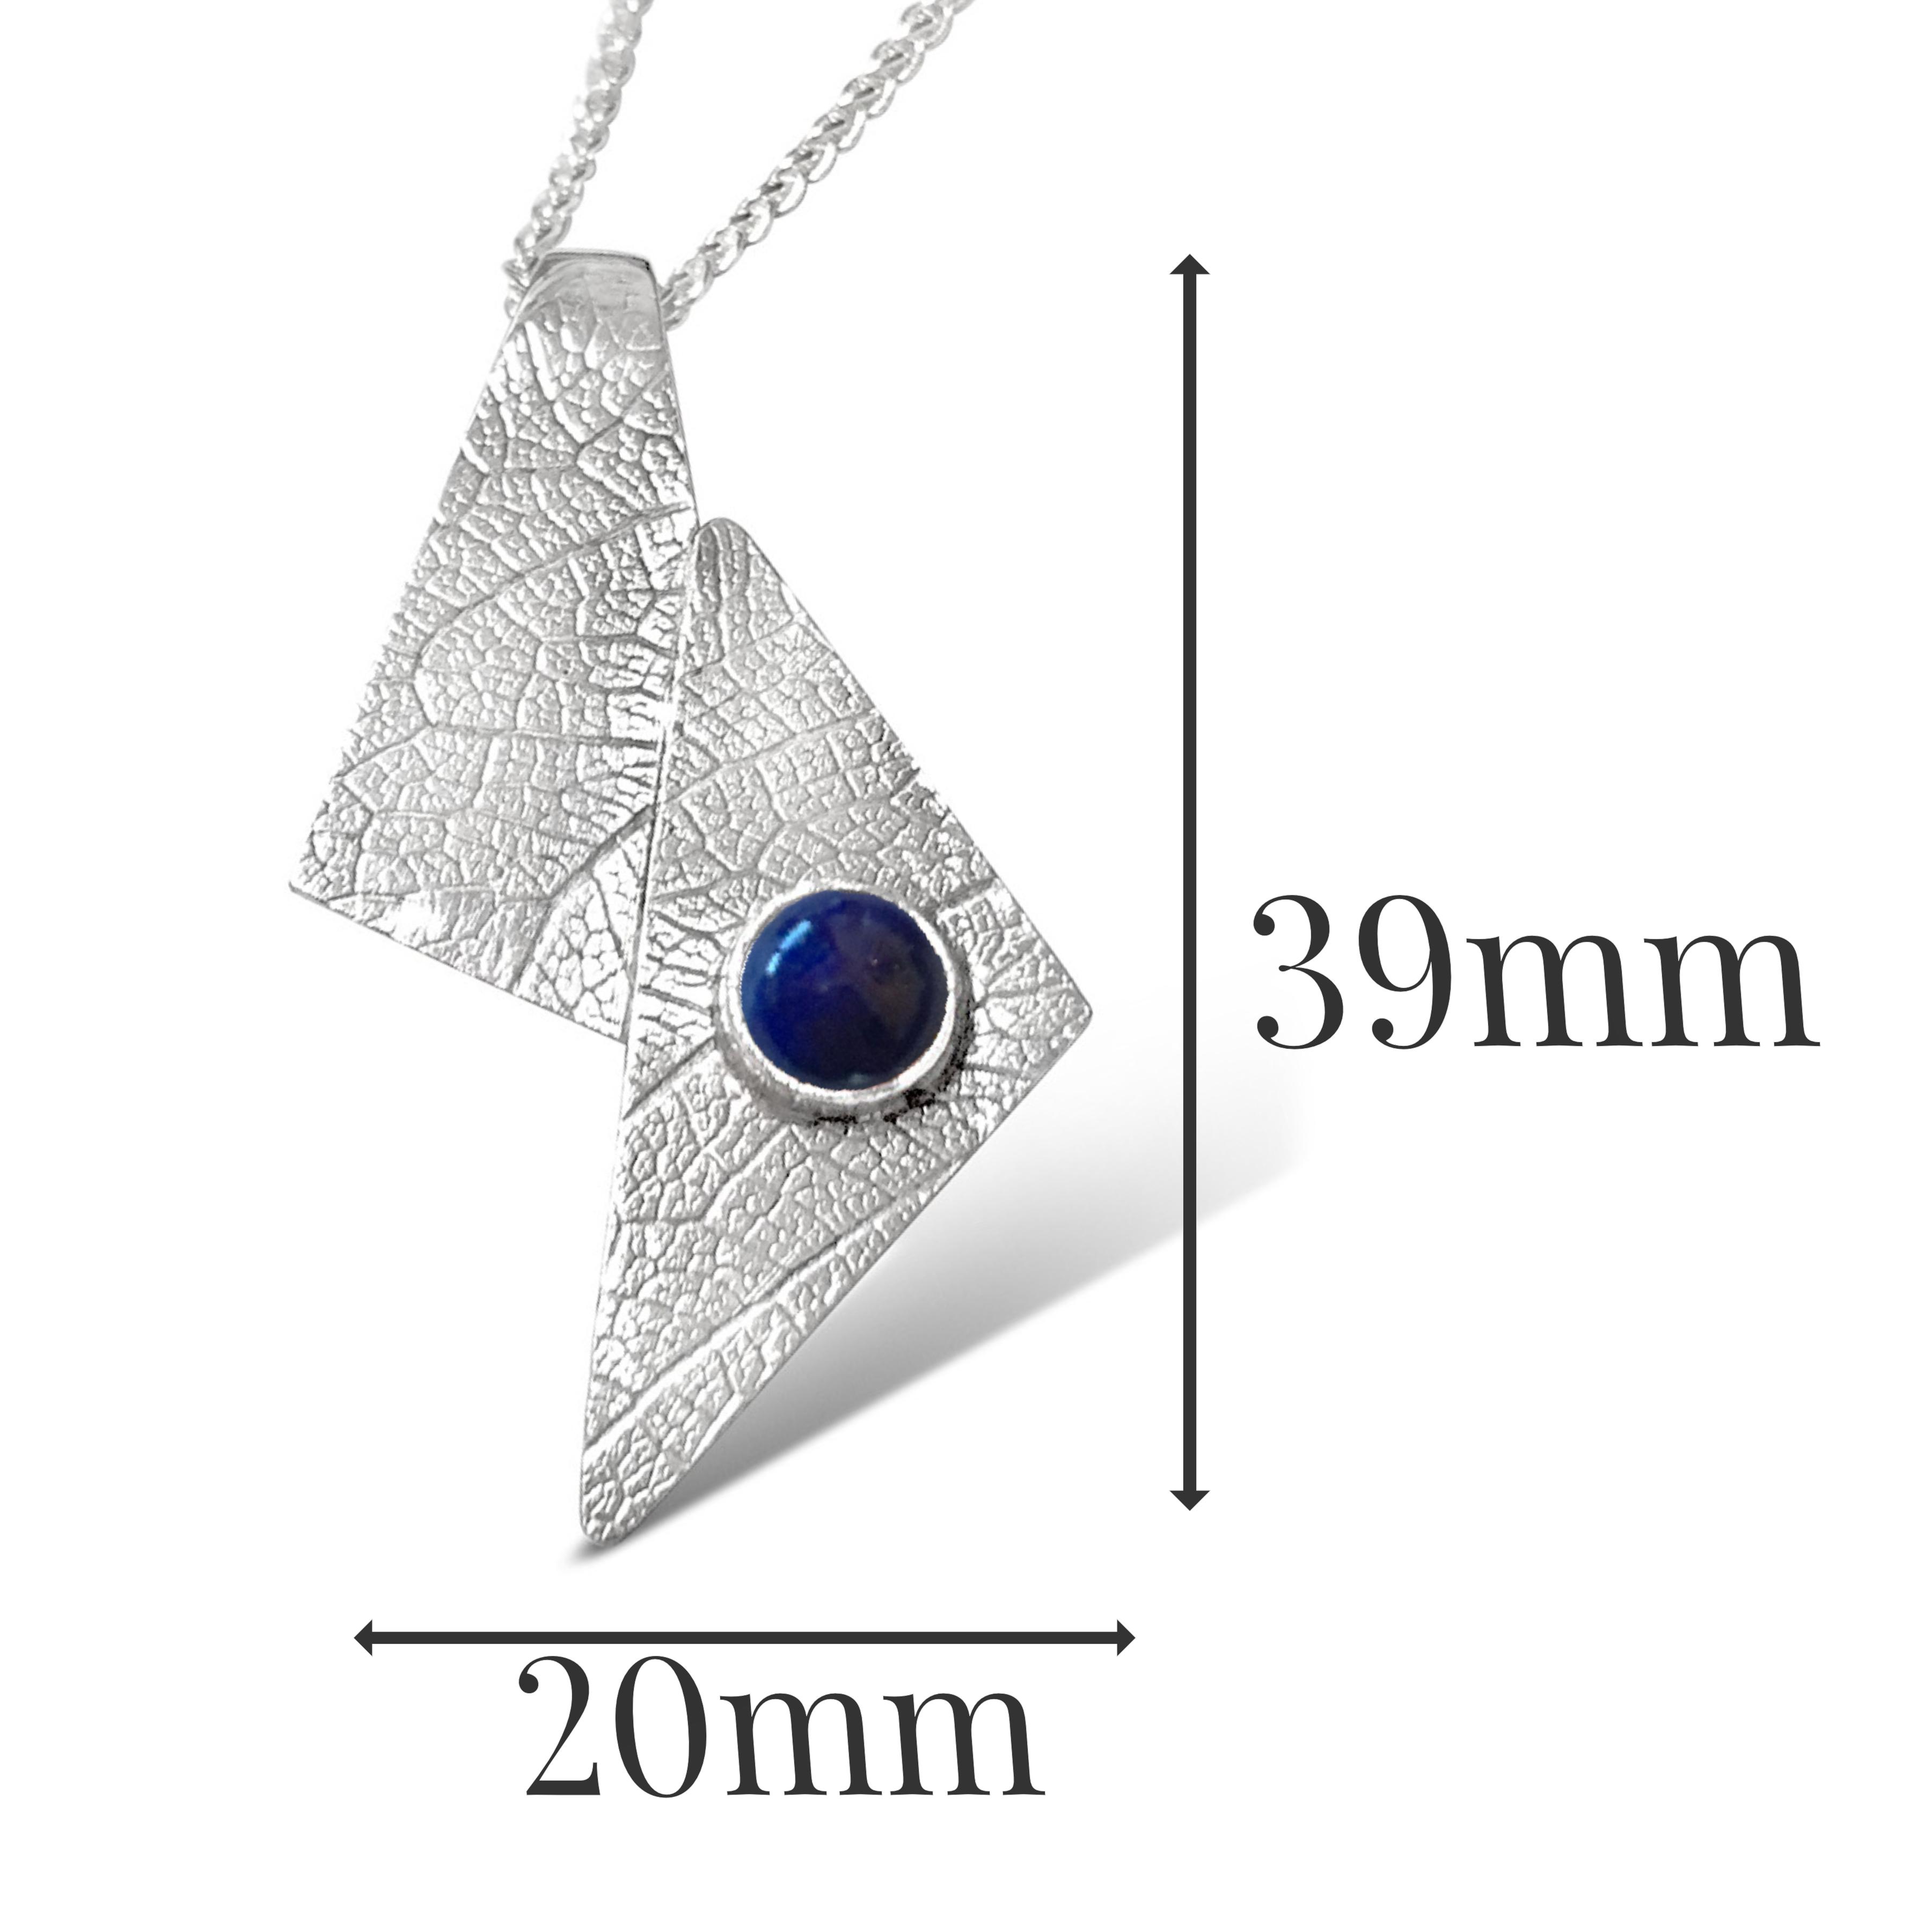 LP541 - Silver Lapis Lazuli Pendant Sizes